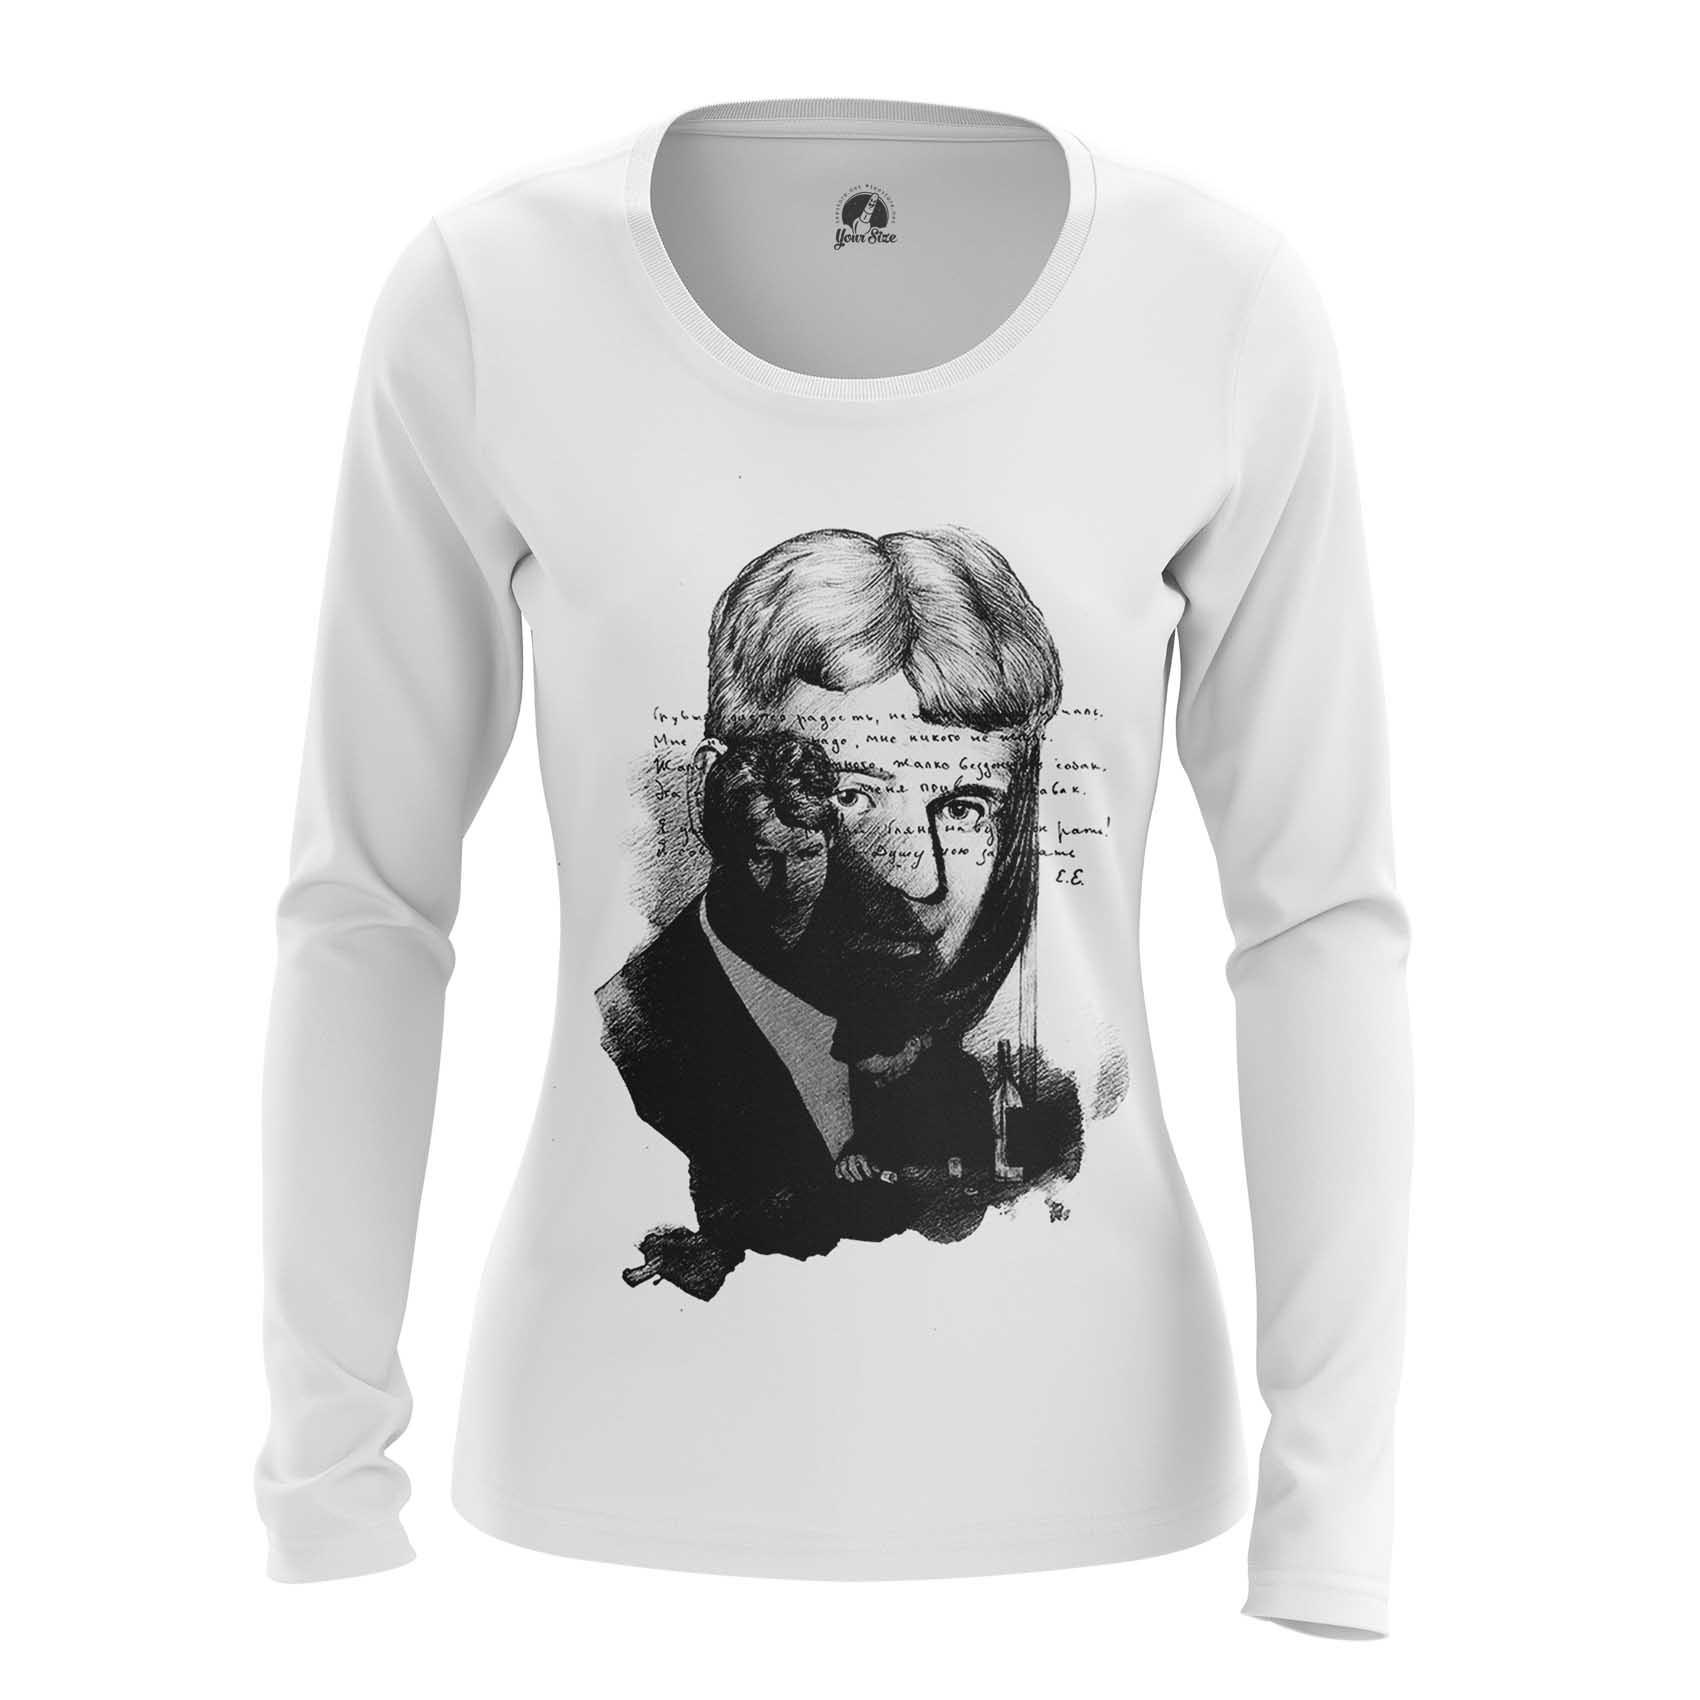 Merchandise Women'S Tank Sergei Yesenin Black White Paint Vest